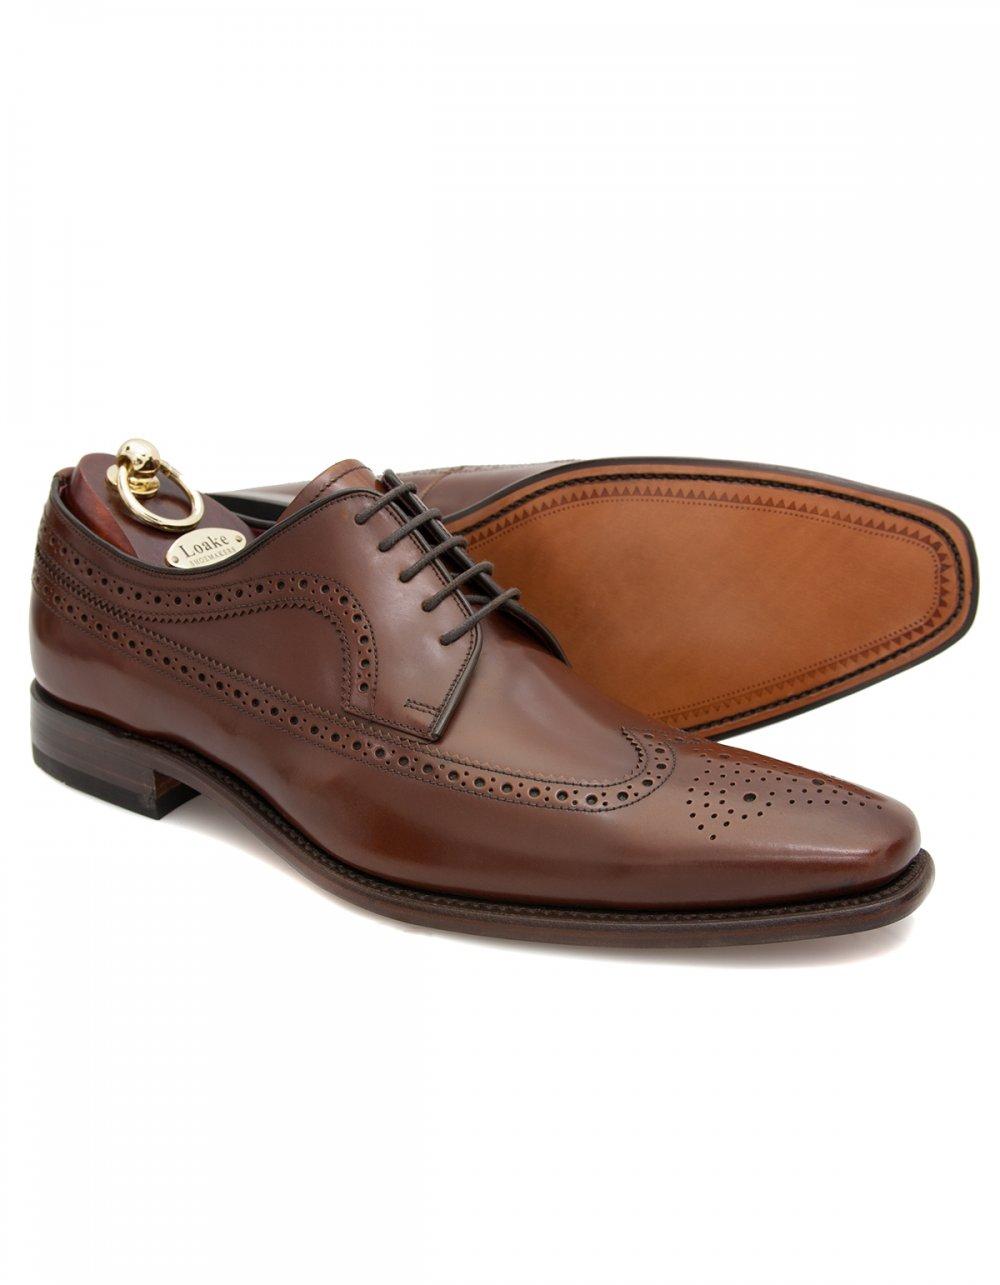 Loake Harry Shoes Uk